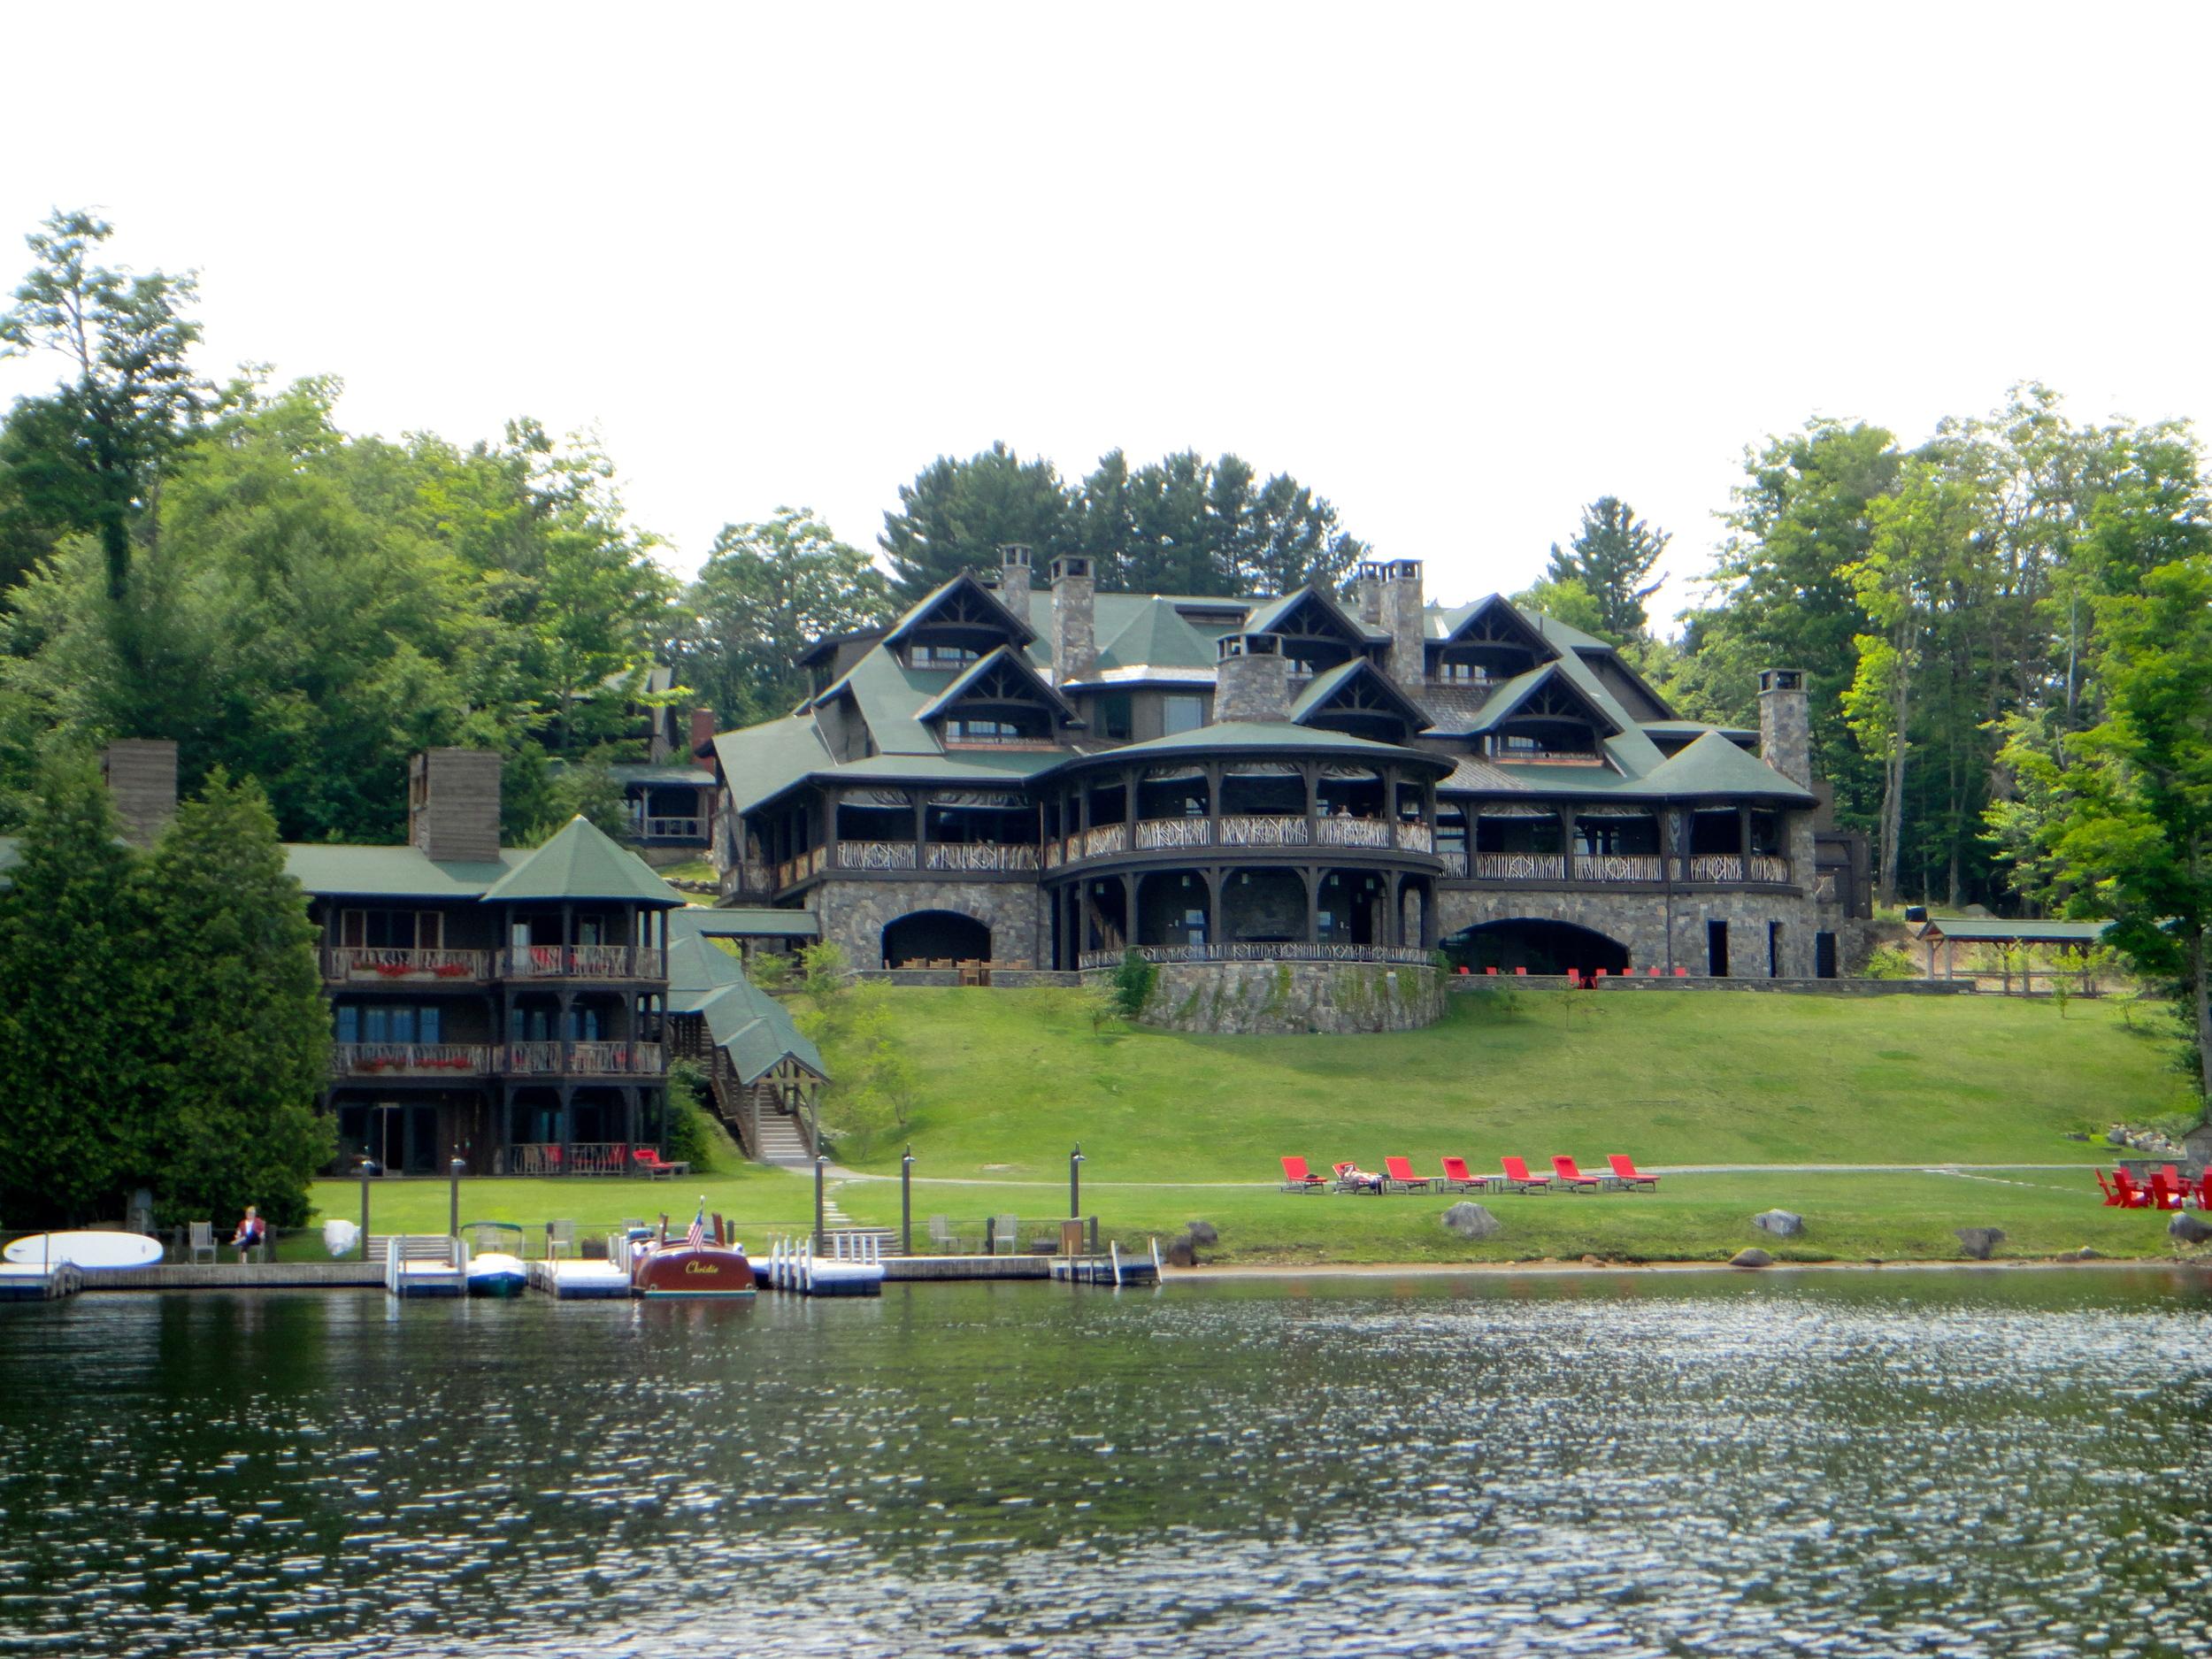 The Lake Placid Lodge on Lake Placid